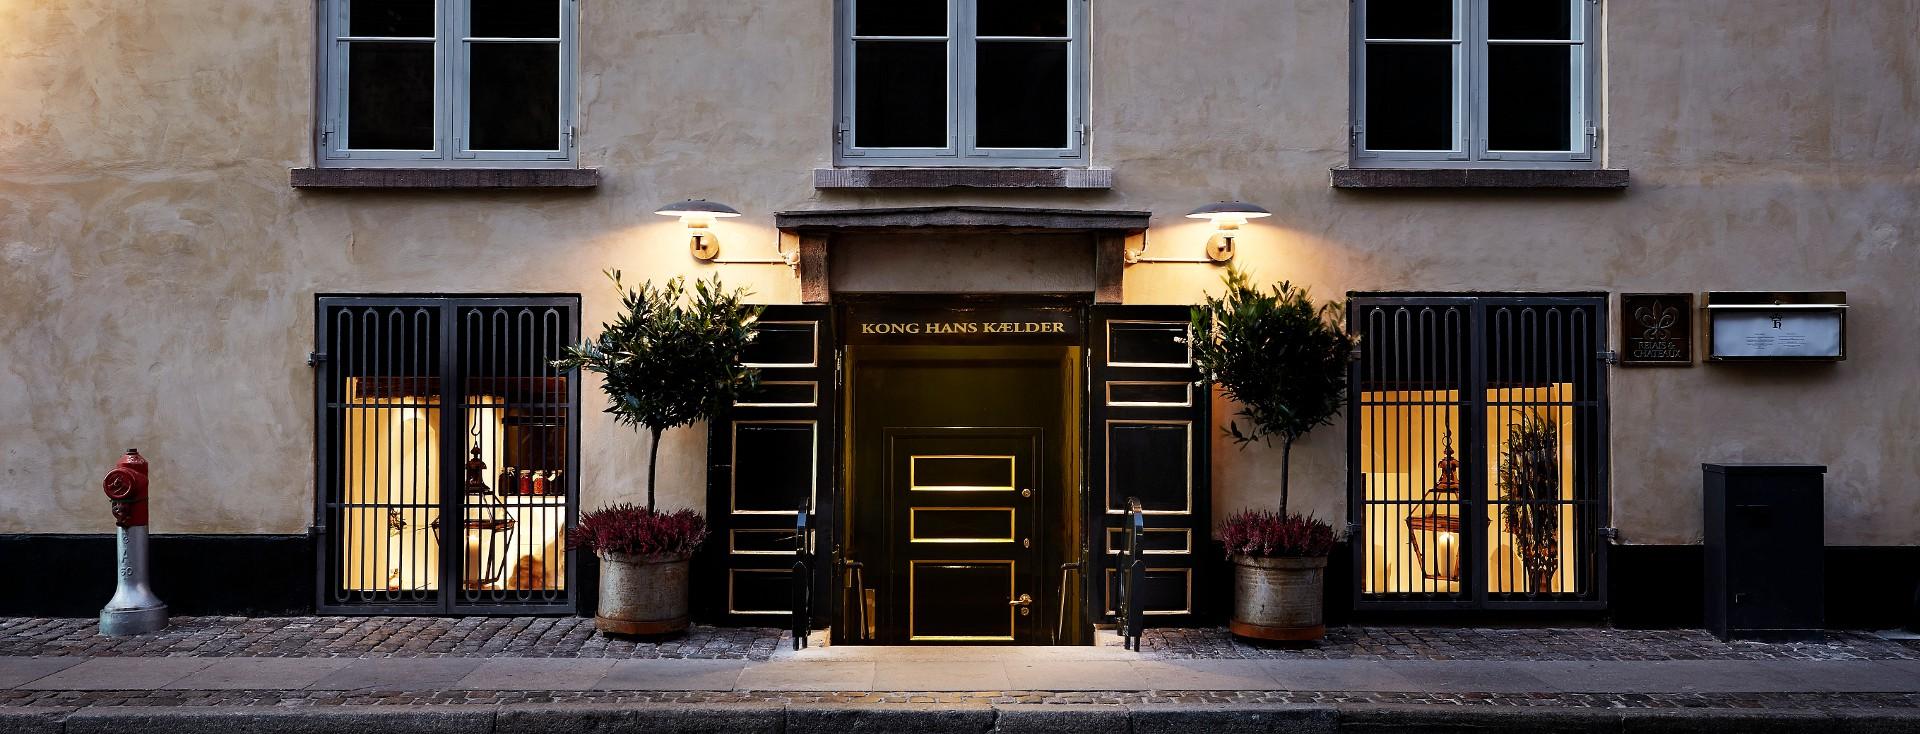 Restaurant Kong Hans Kælder